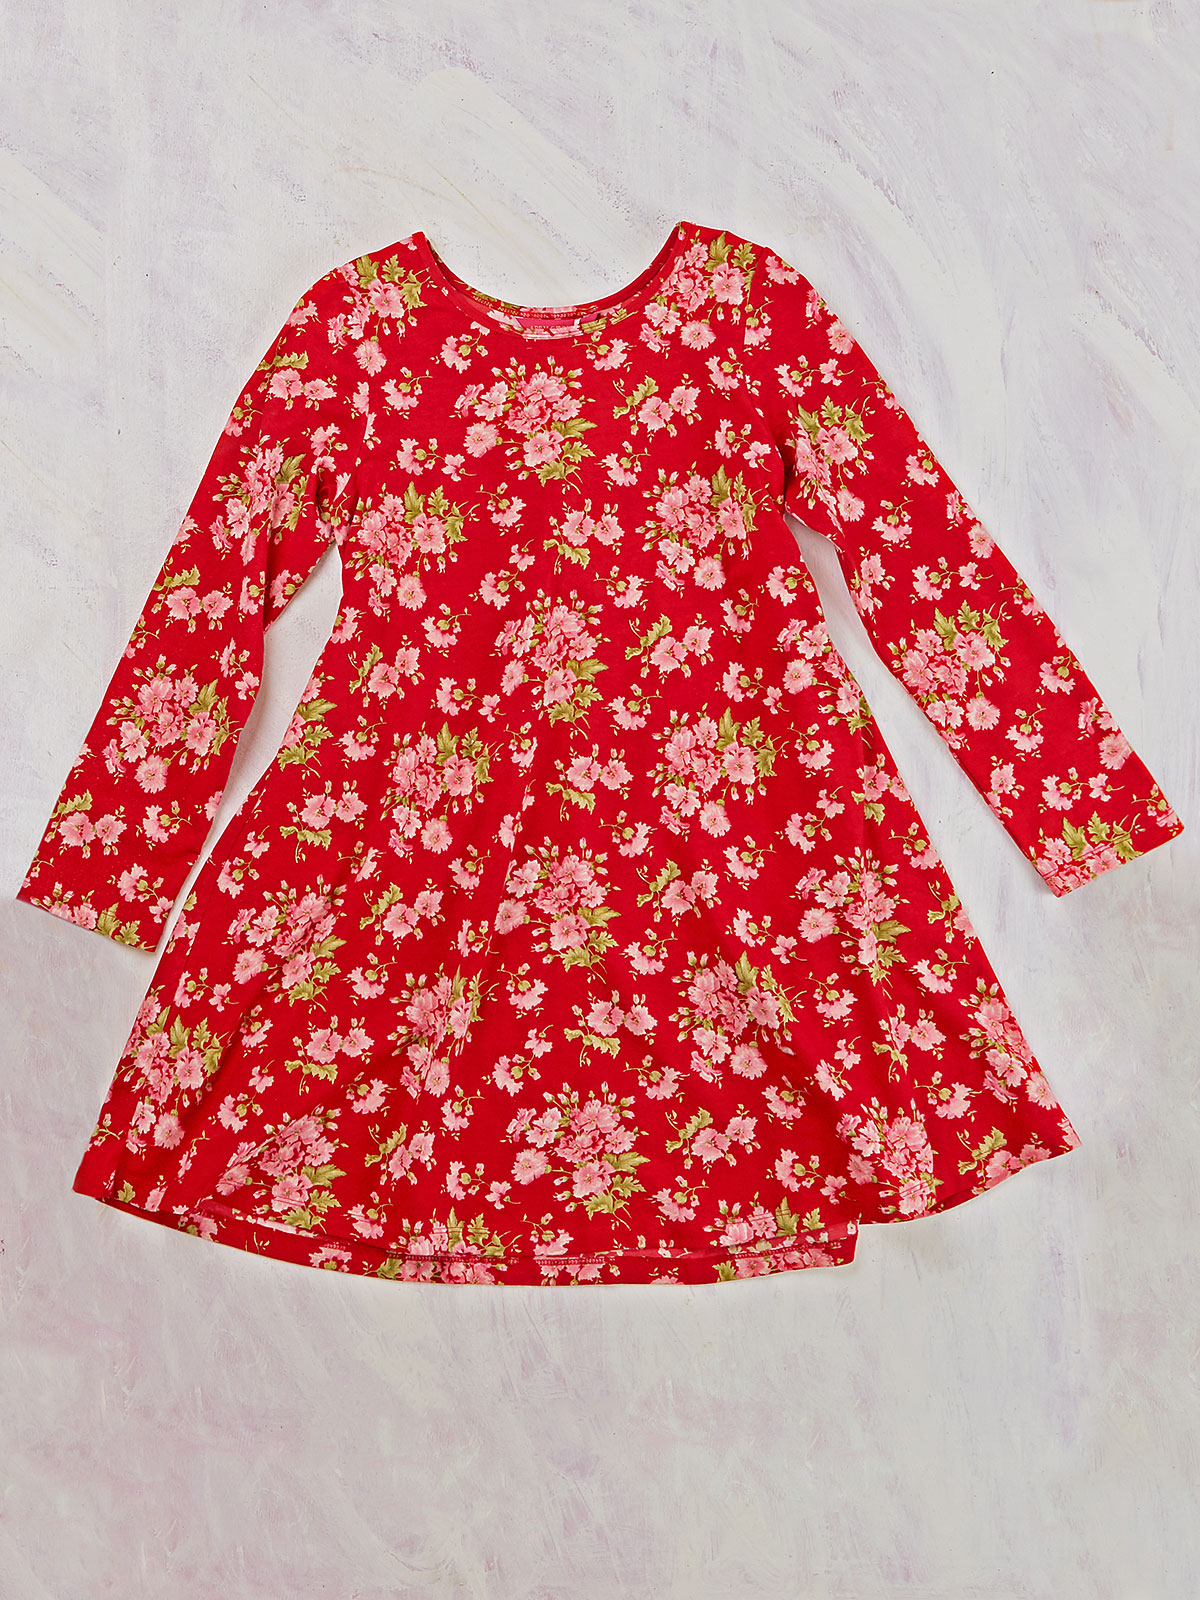 Carnation Jersey Young Lady Dress